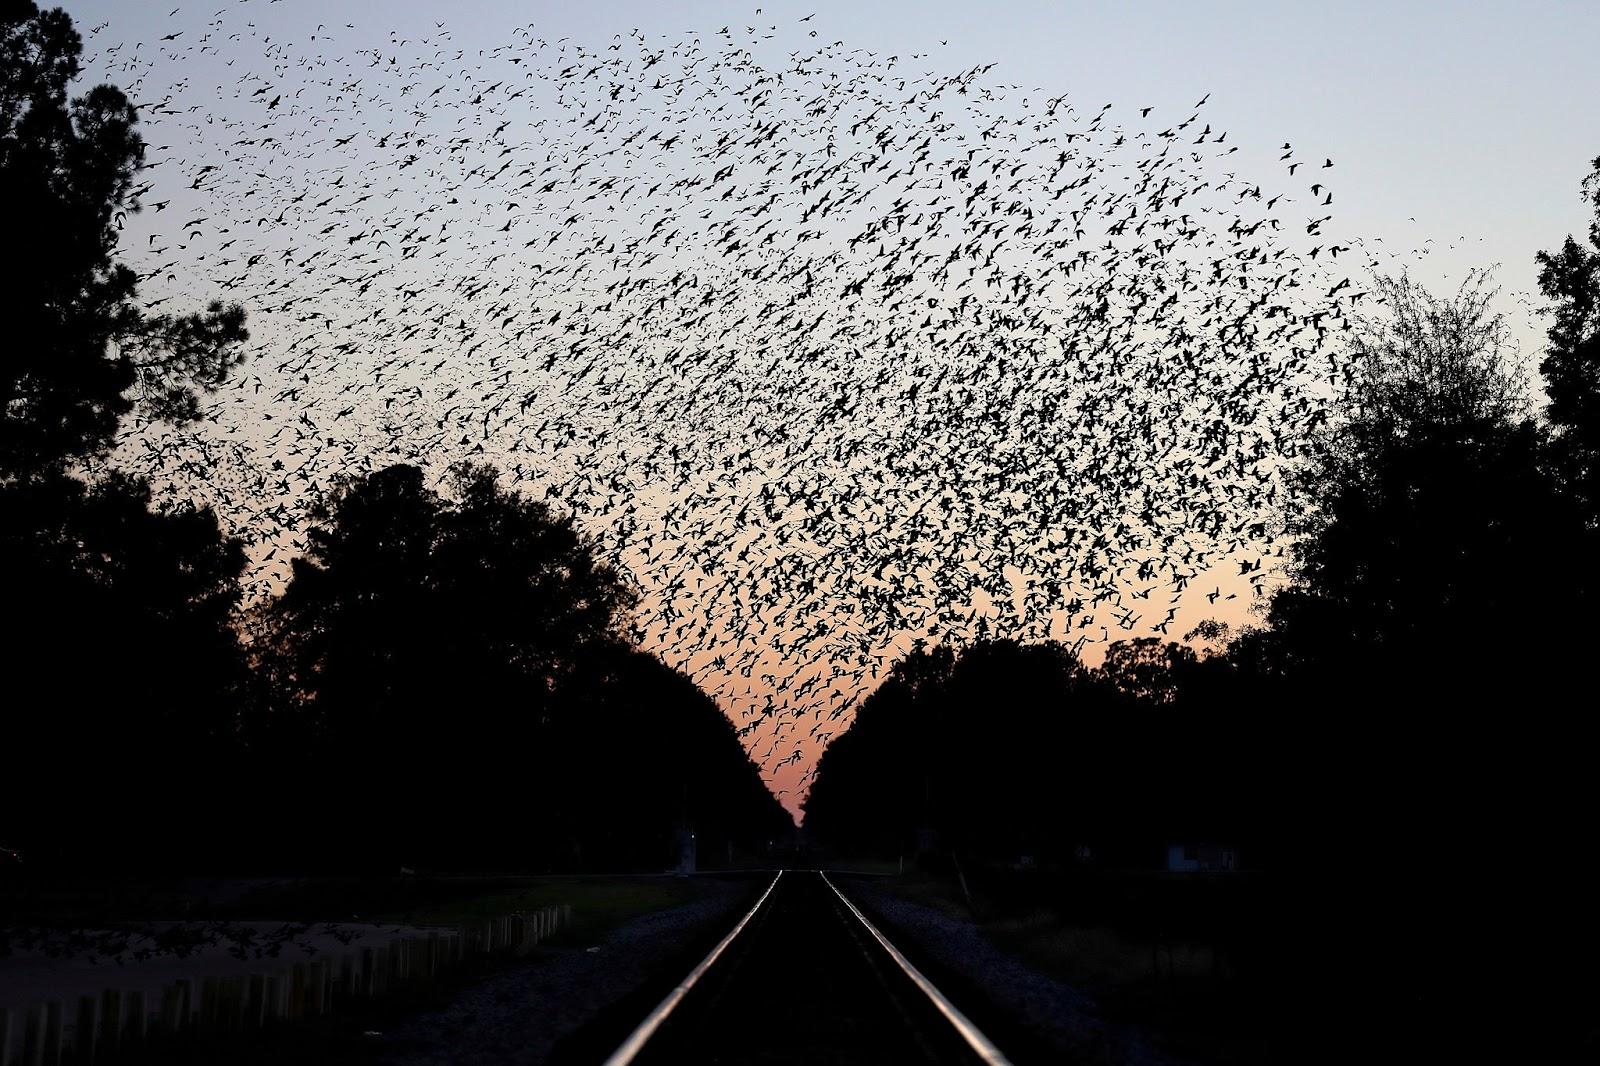 Giving the avian endangerment crisis perspective